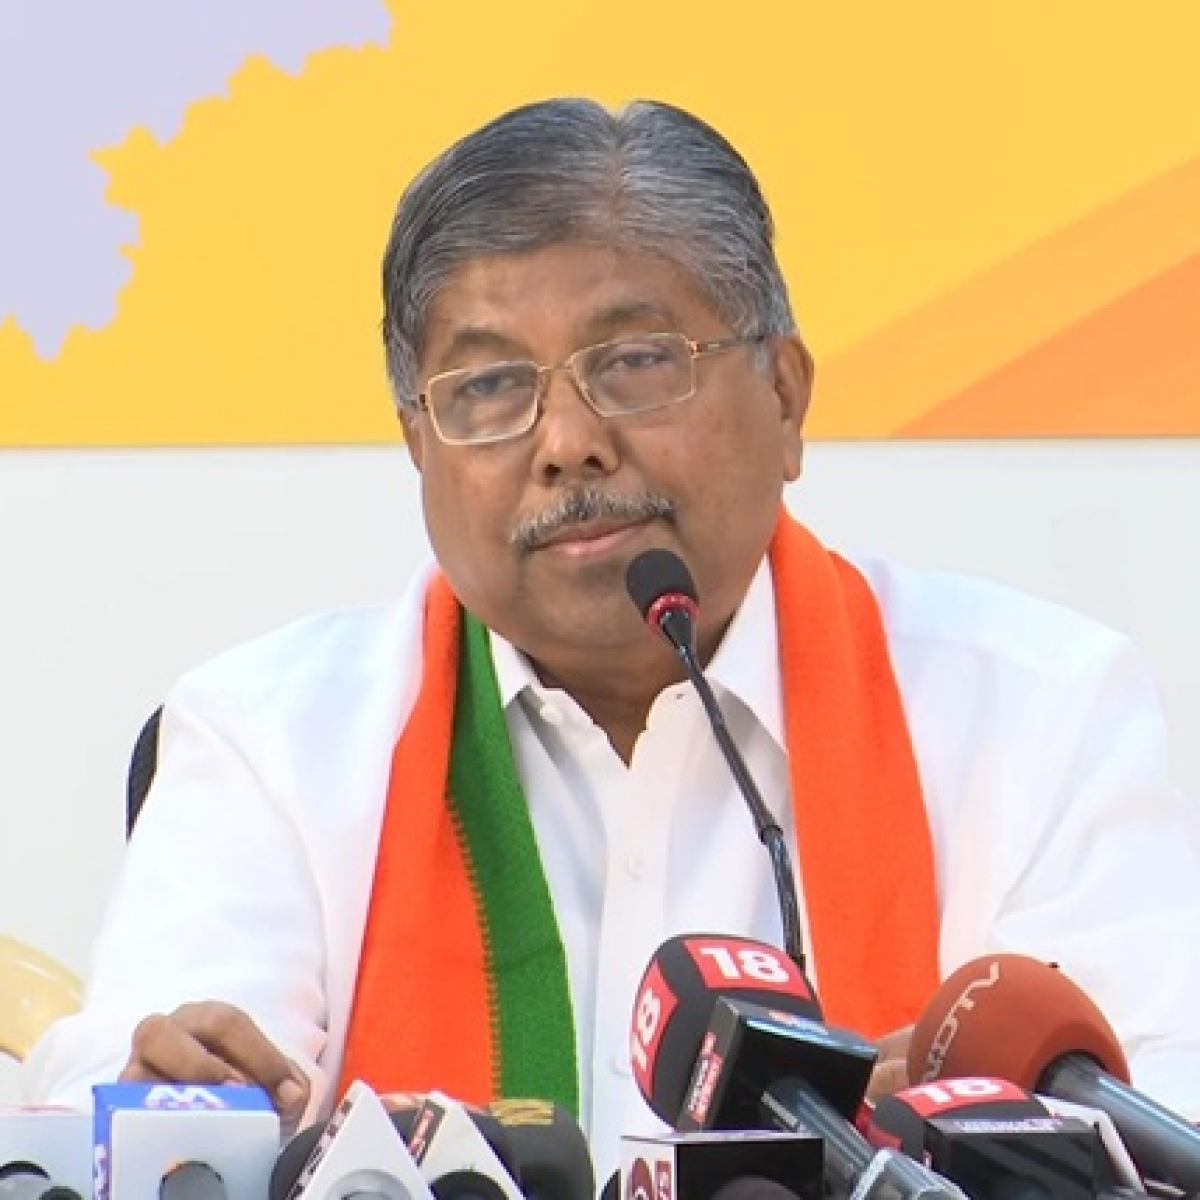 Shiv Sena betrayed mandate, this compelled BJP to form govt: Chandrakant Patil